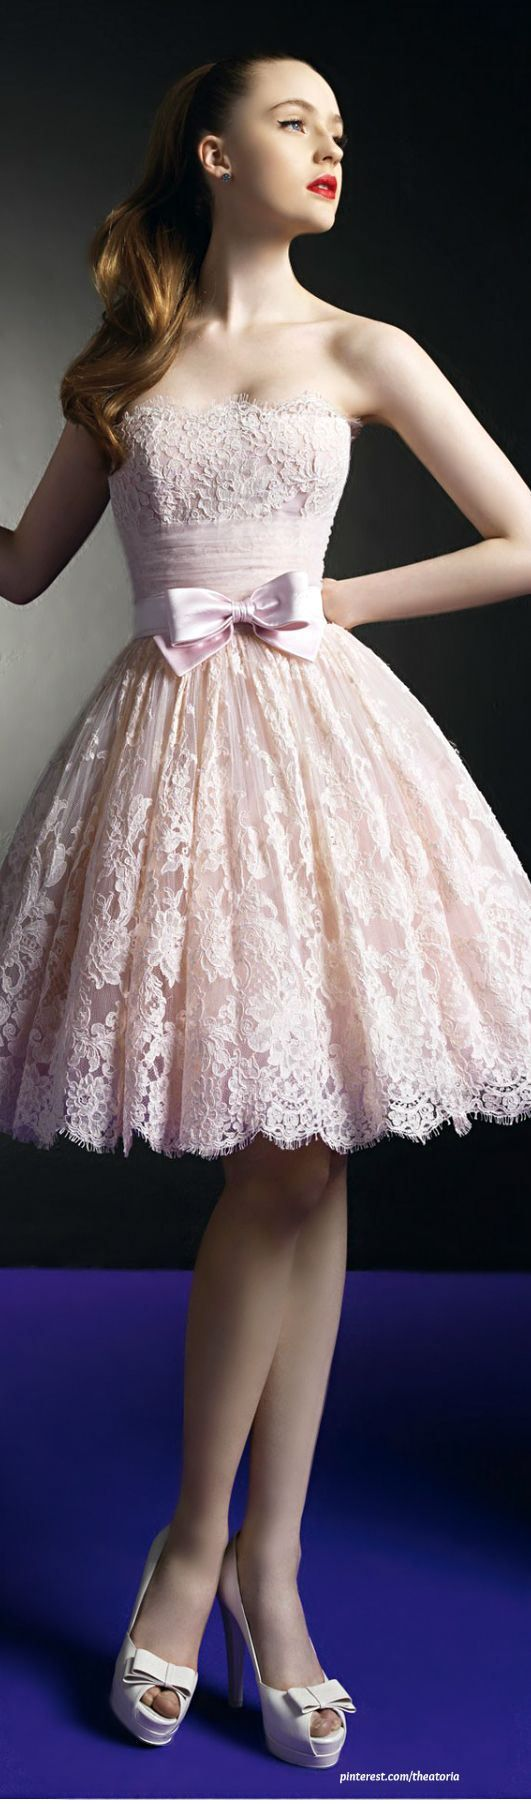 Pink cocktail dress for wedding   best images about Vestidos on Pinterest  Prom dresses Cocktail